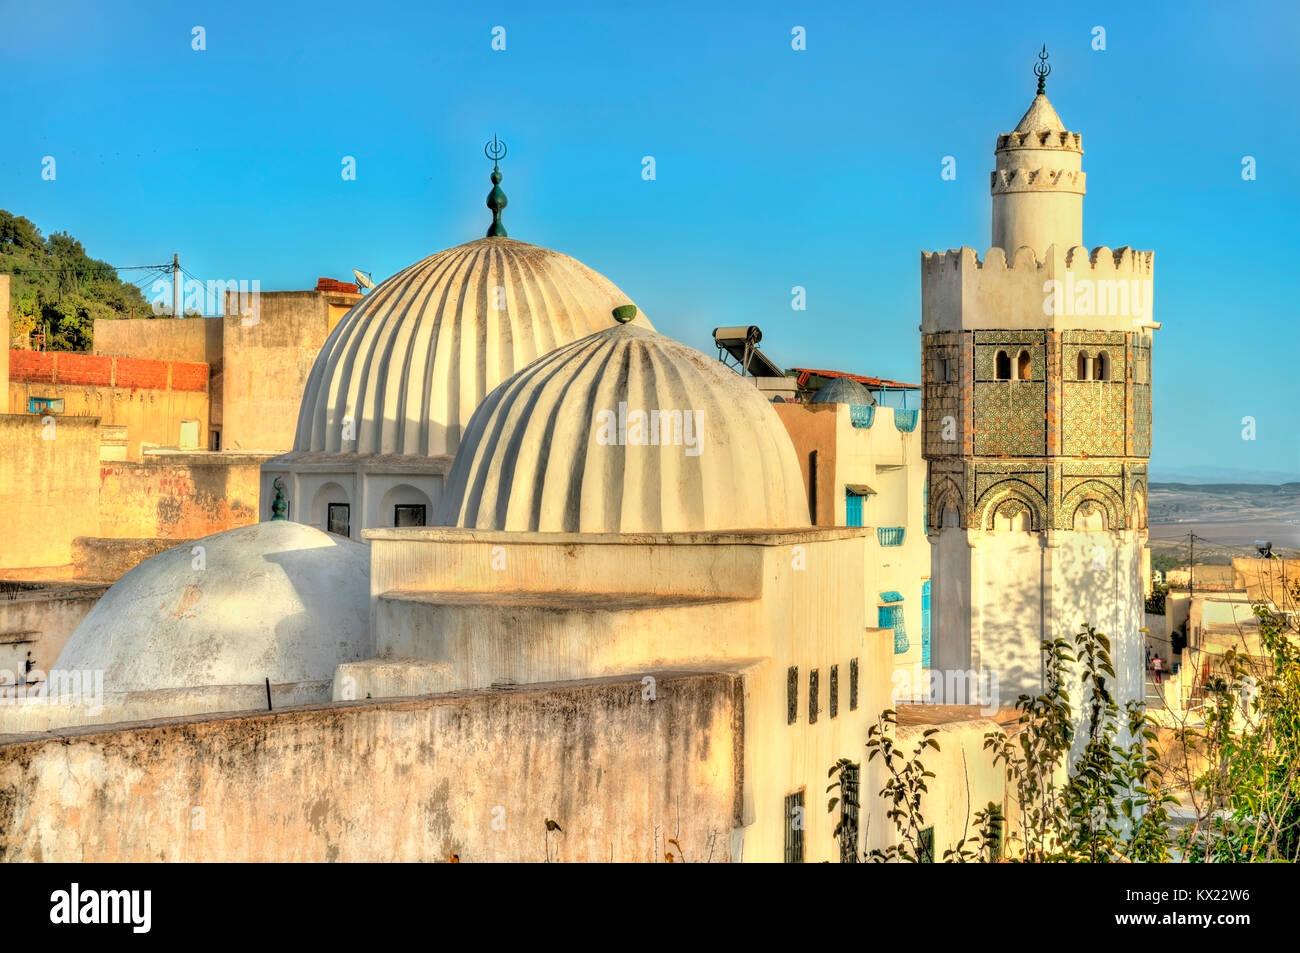 Sidi Bou Moschea Makhlouf a El Kef in Tunisia Immagini Stock